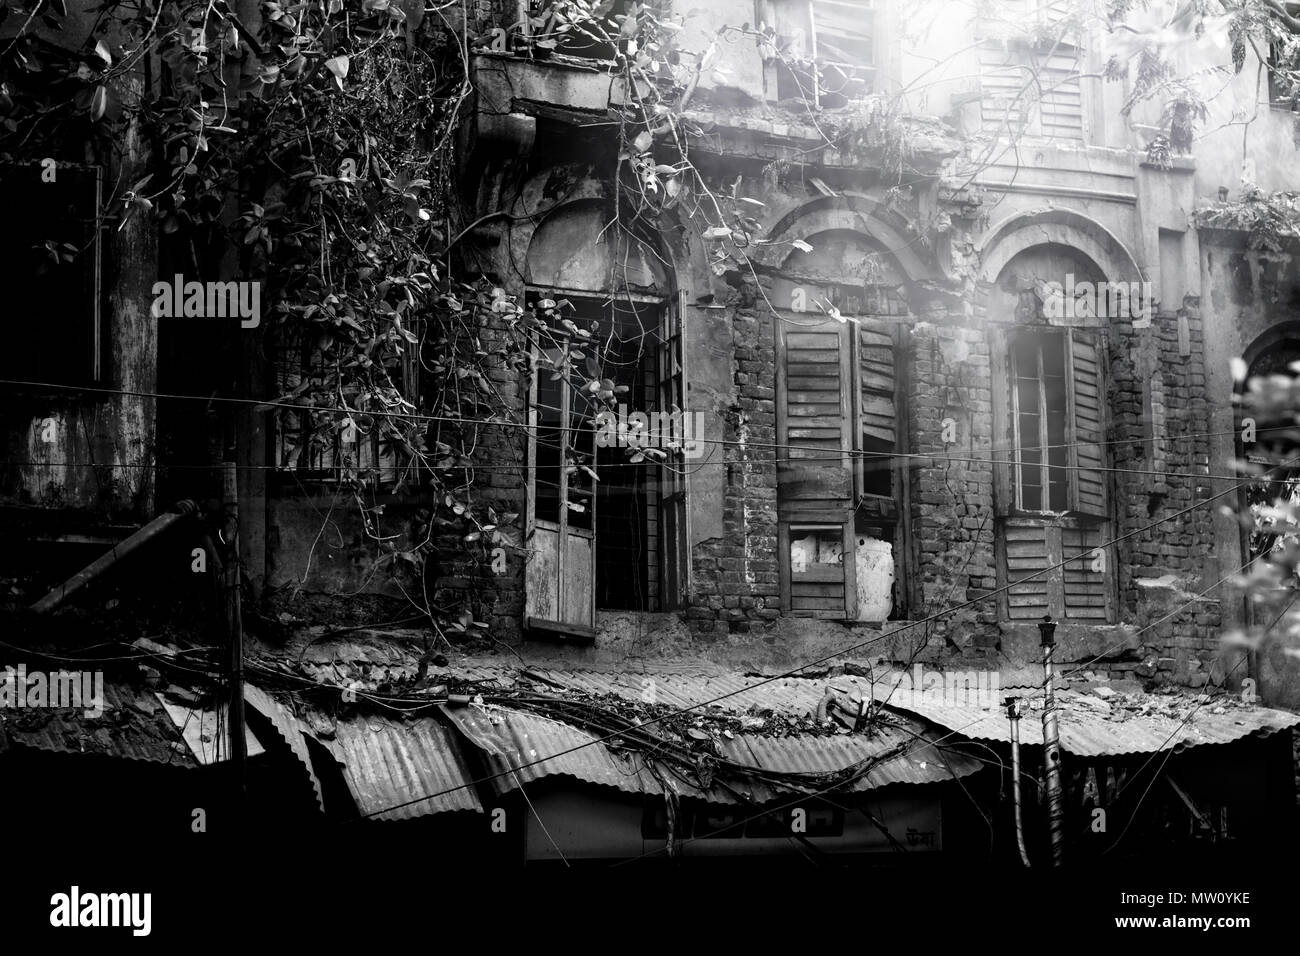 kolkata rickshawala,taxi, indian street photography,rickshaw,india,love,sad,happyness,happy,struggle,road,homeless,lonely,lonelyness,city,old home,fog - Stock Image